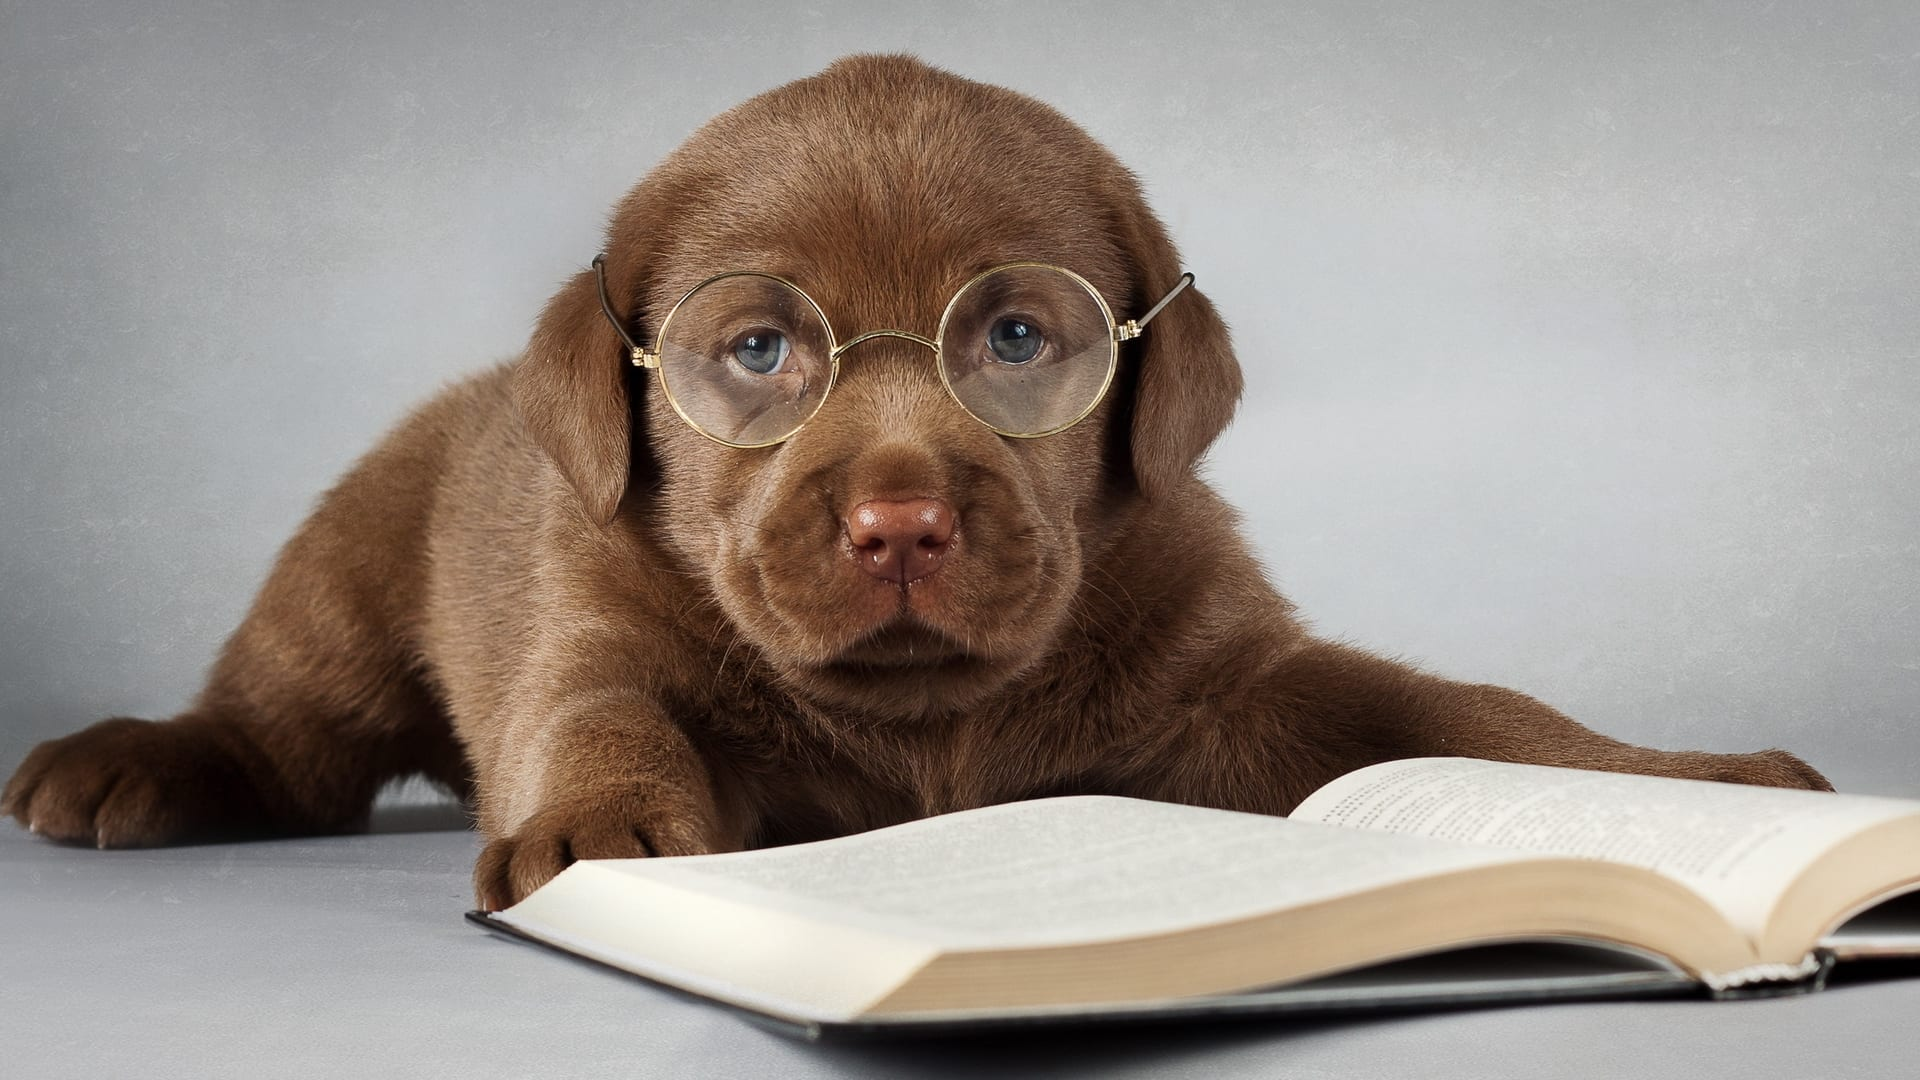 Studying?